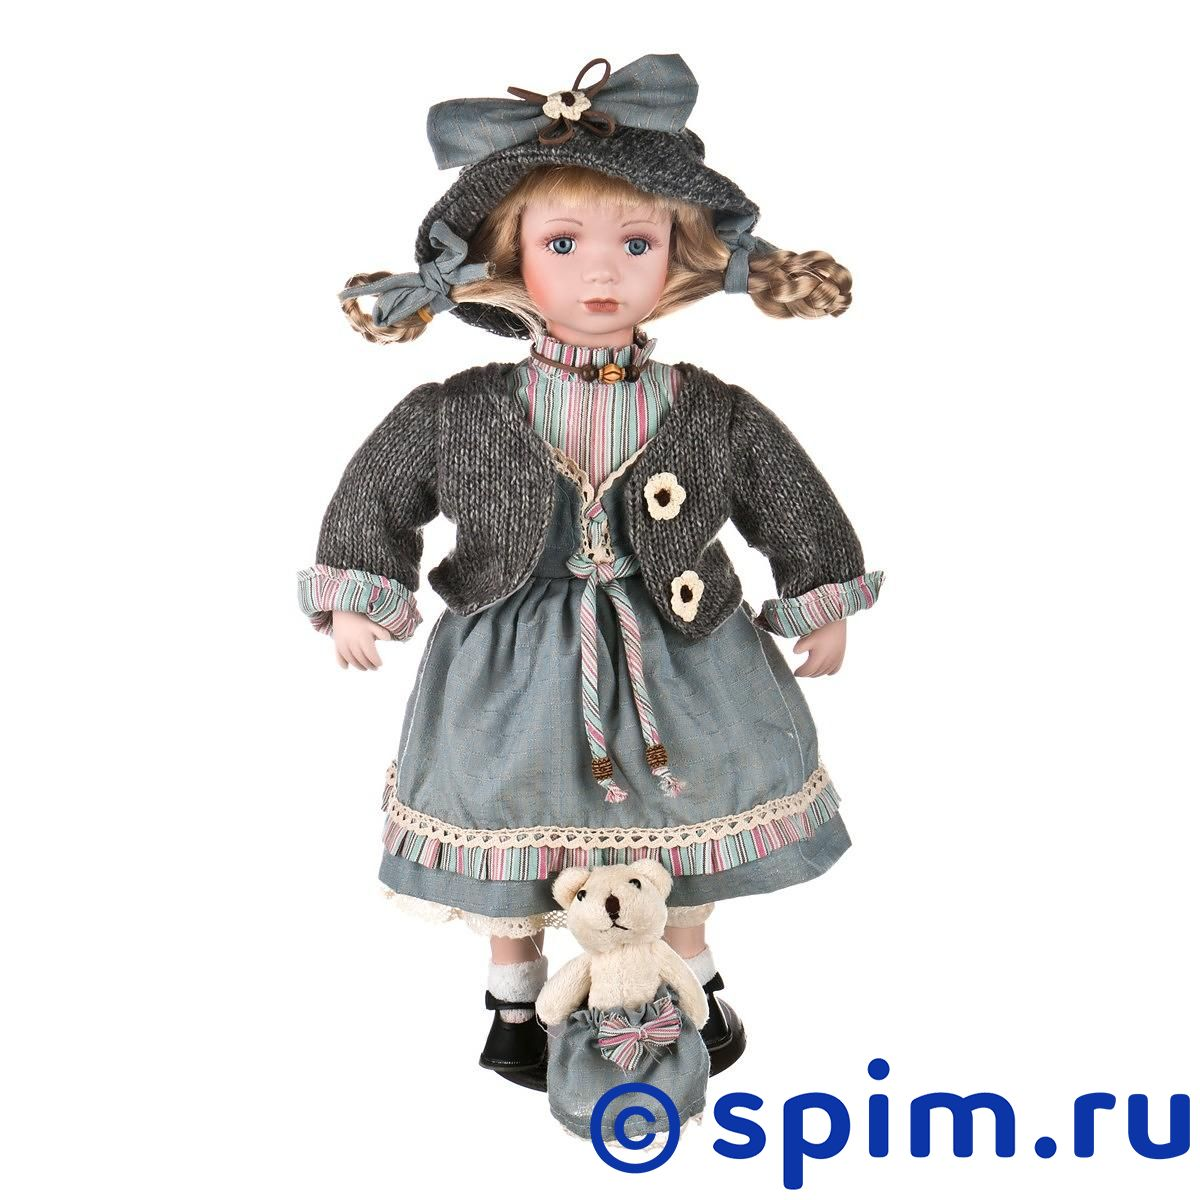 Фарфоровая кукла 346-192